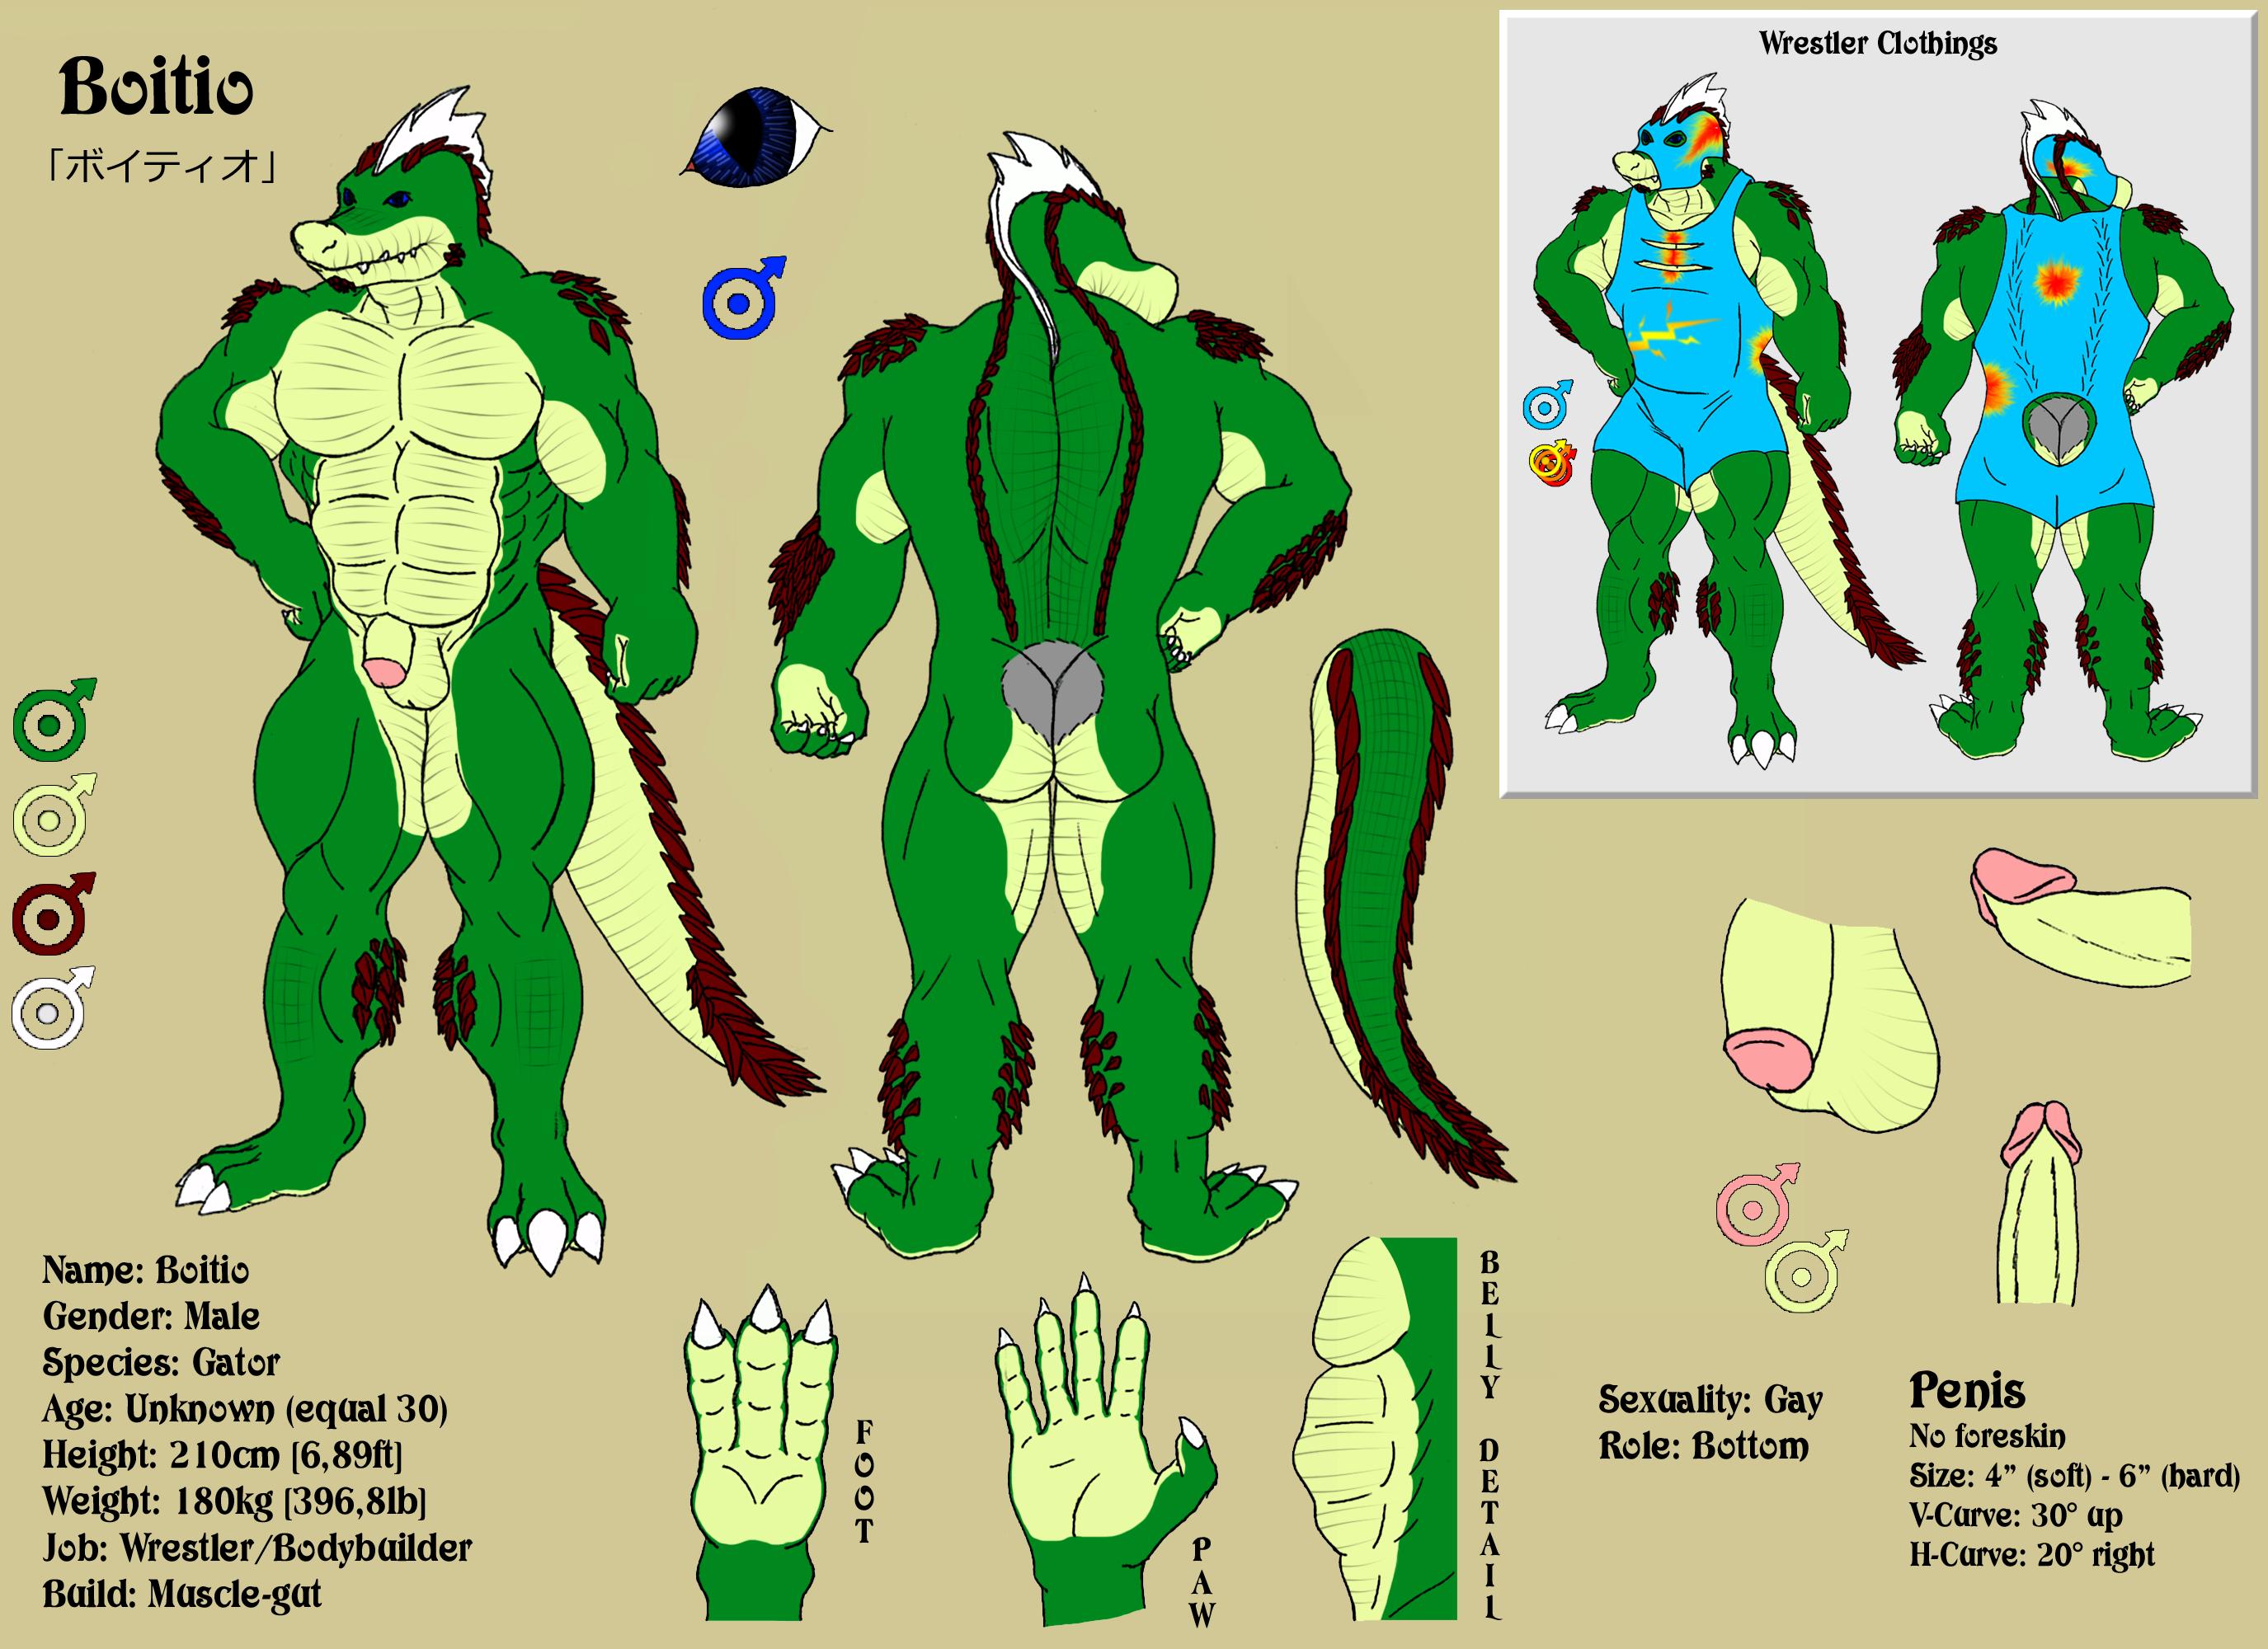 Character Sheet - Boitio (18)